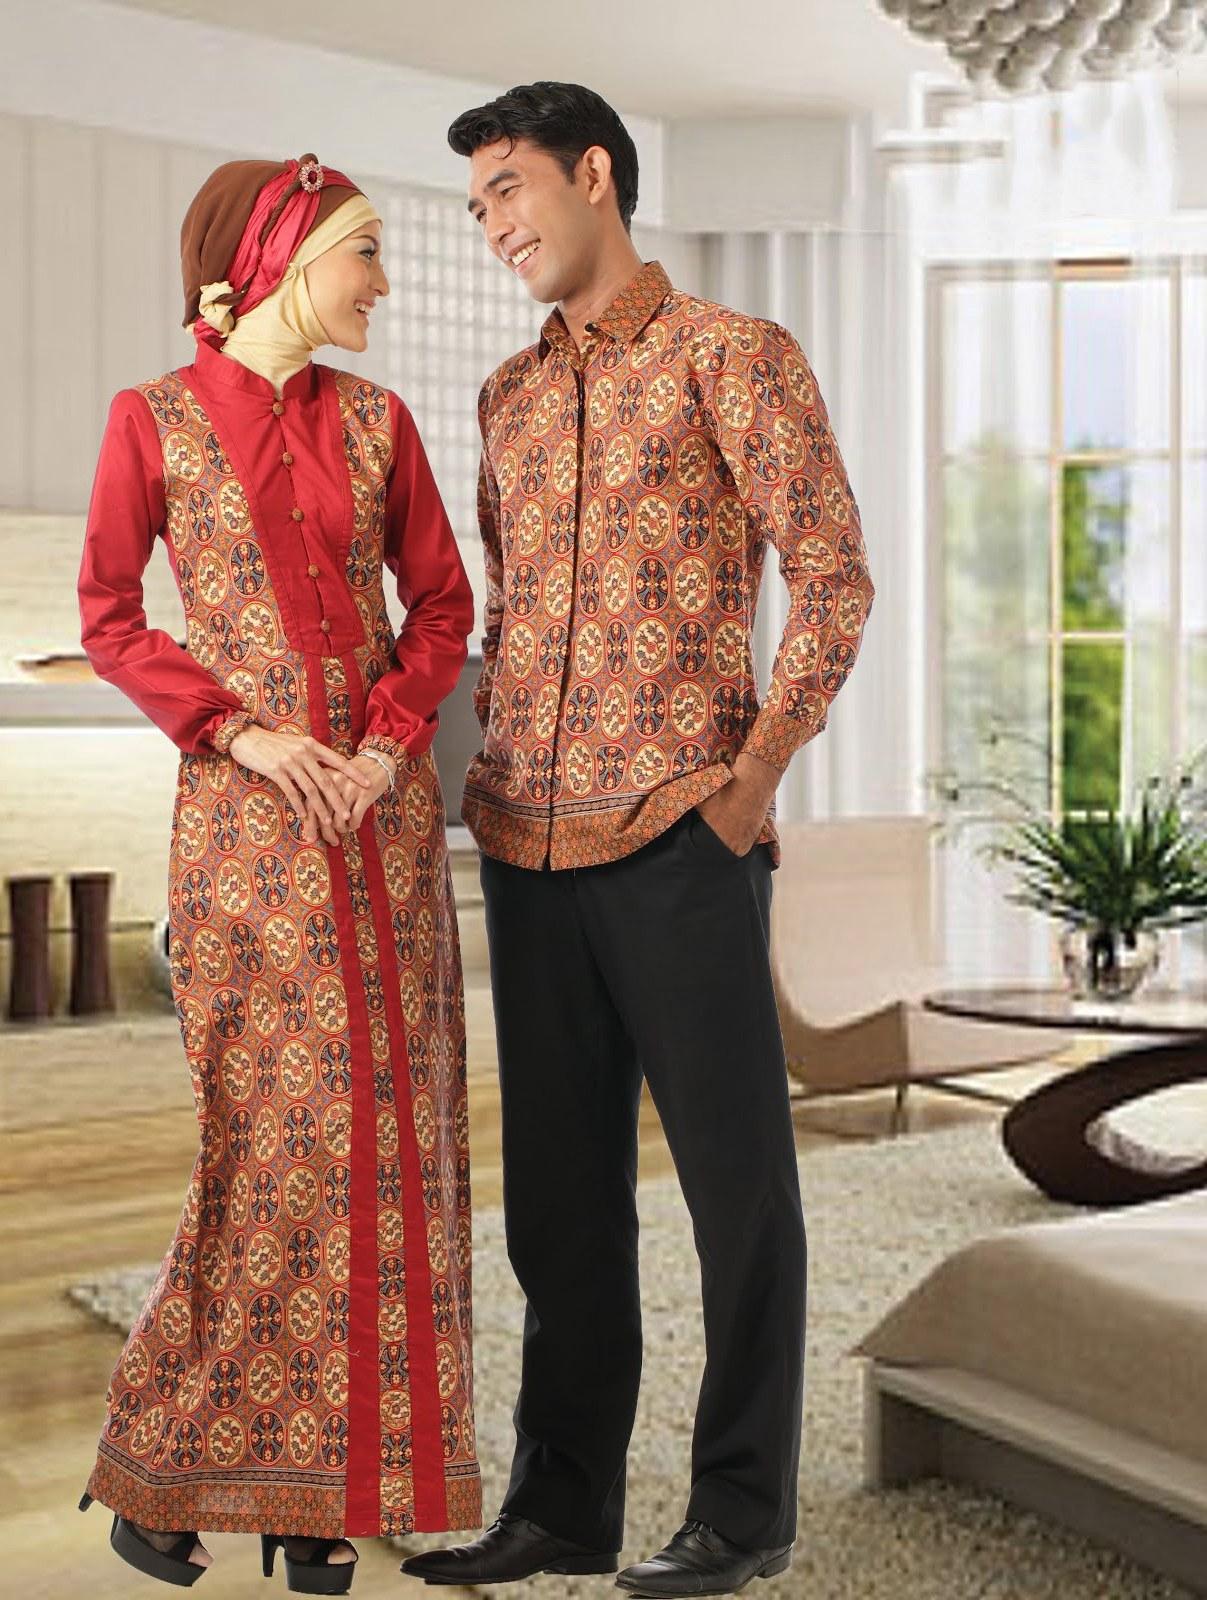 Bentuk Model Baju Lebaran Pria O2d5 25 Model Baju Lebaran Couple Untuk Idul Fitri 2018